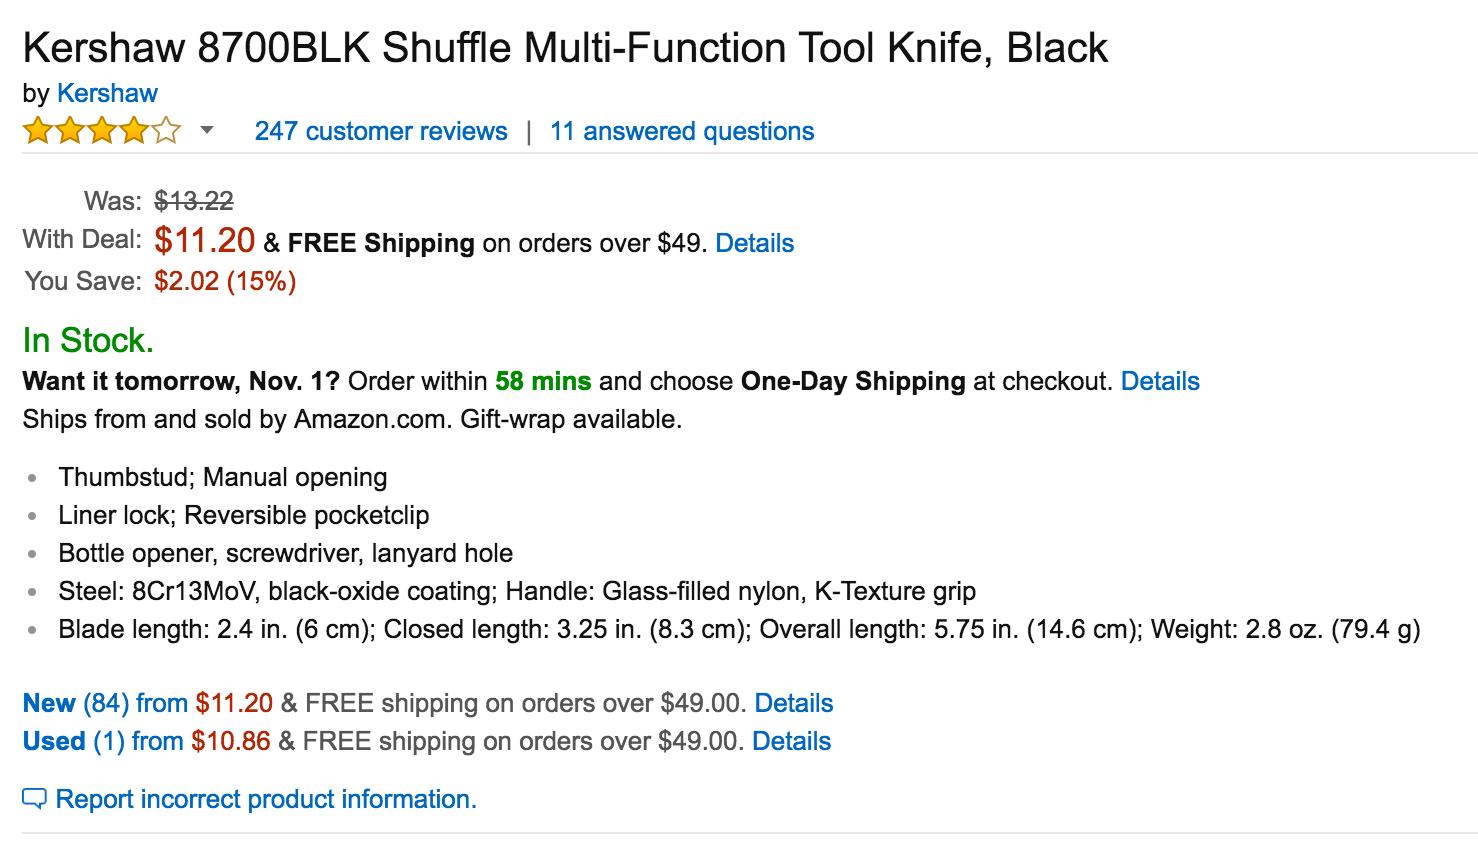 kershaw-8700blk-shuffle-multi-function-tool-knife-2